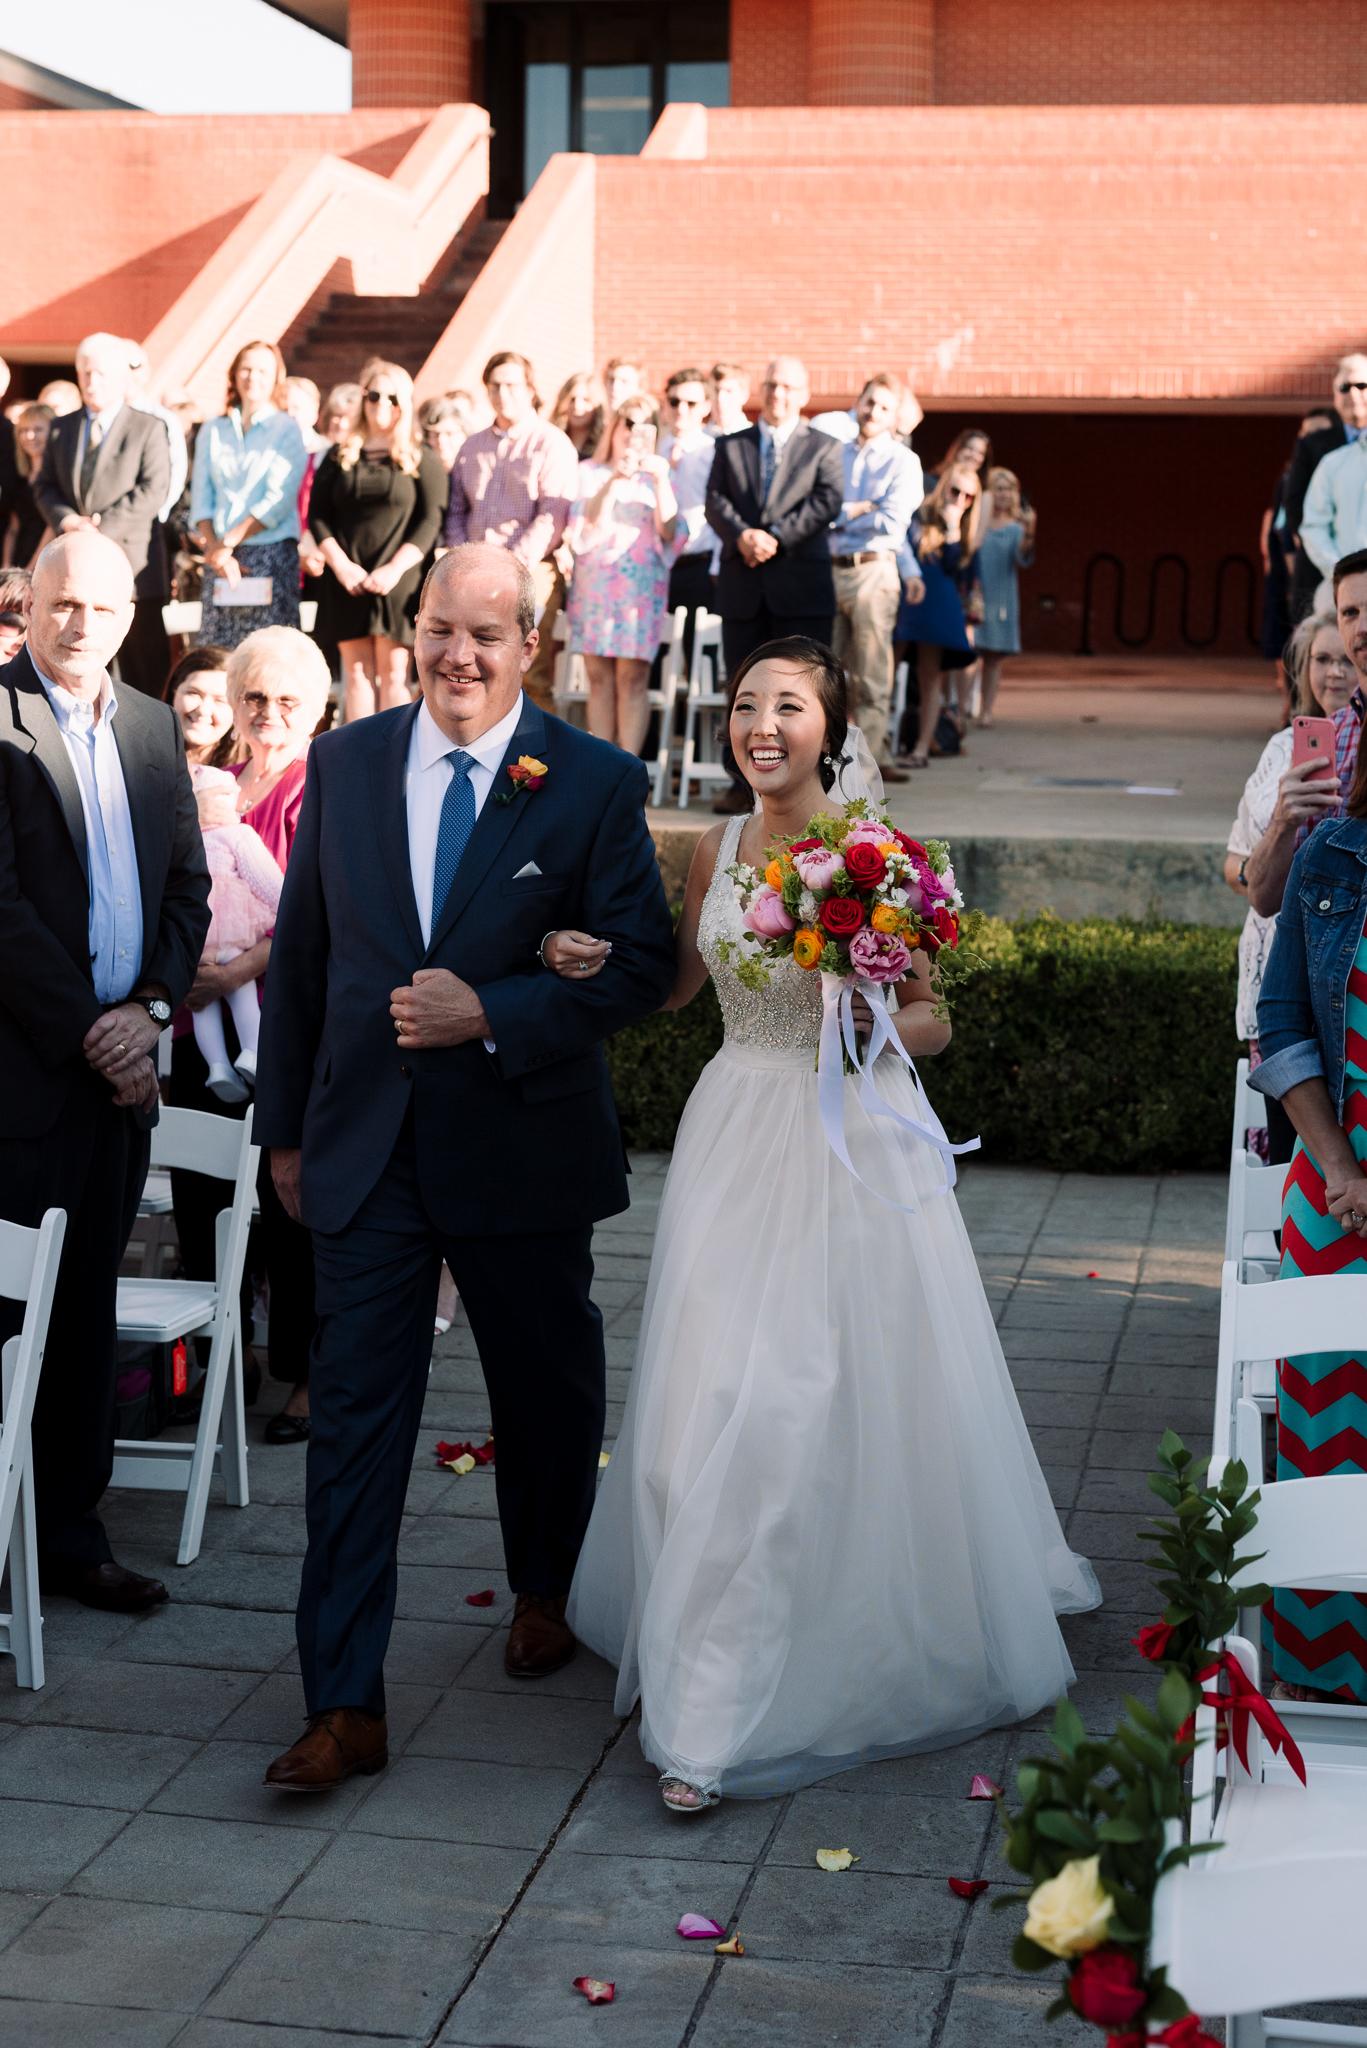 Oklahoma-Christian-University-Wedding-8171.jpg